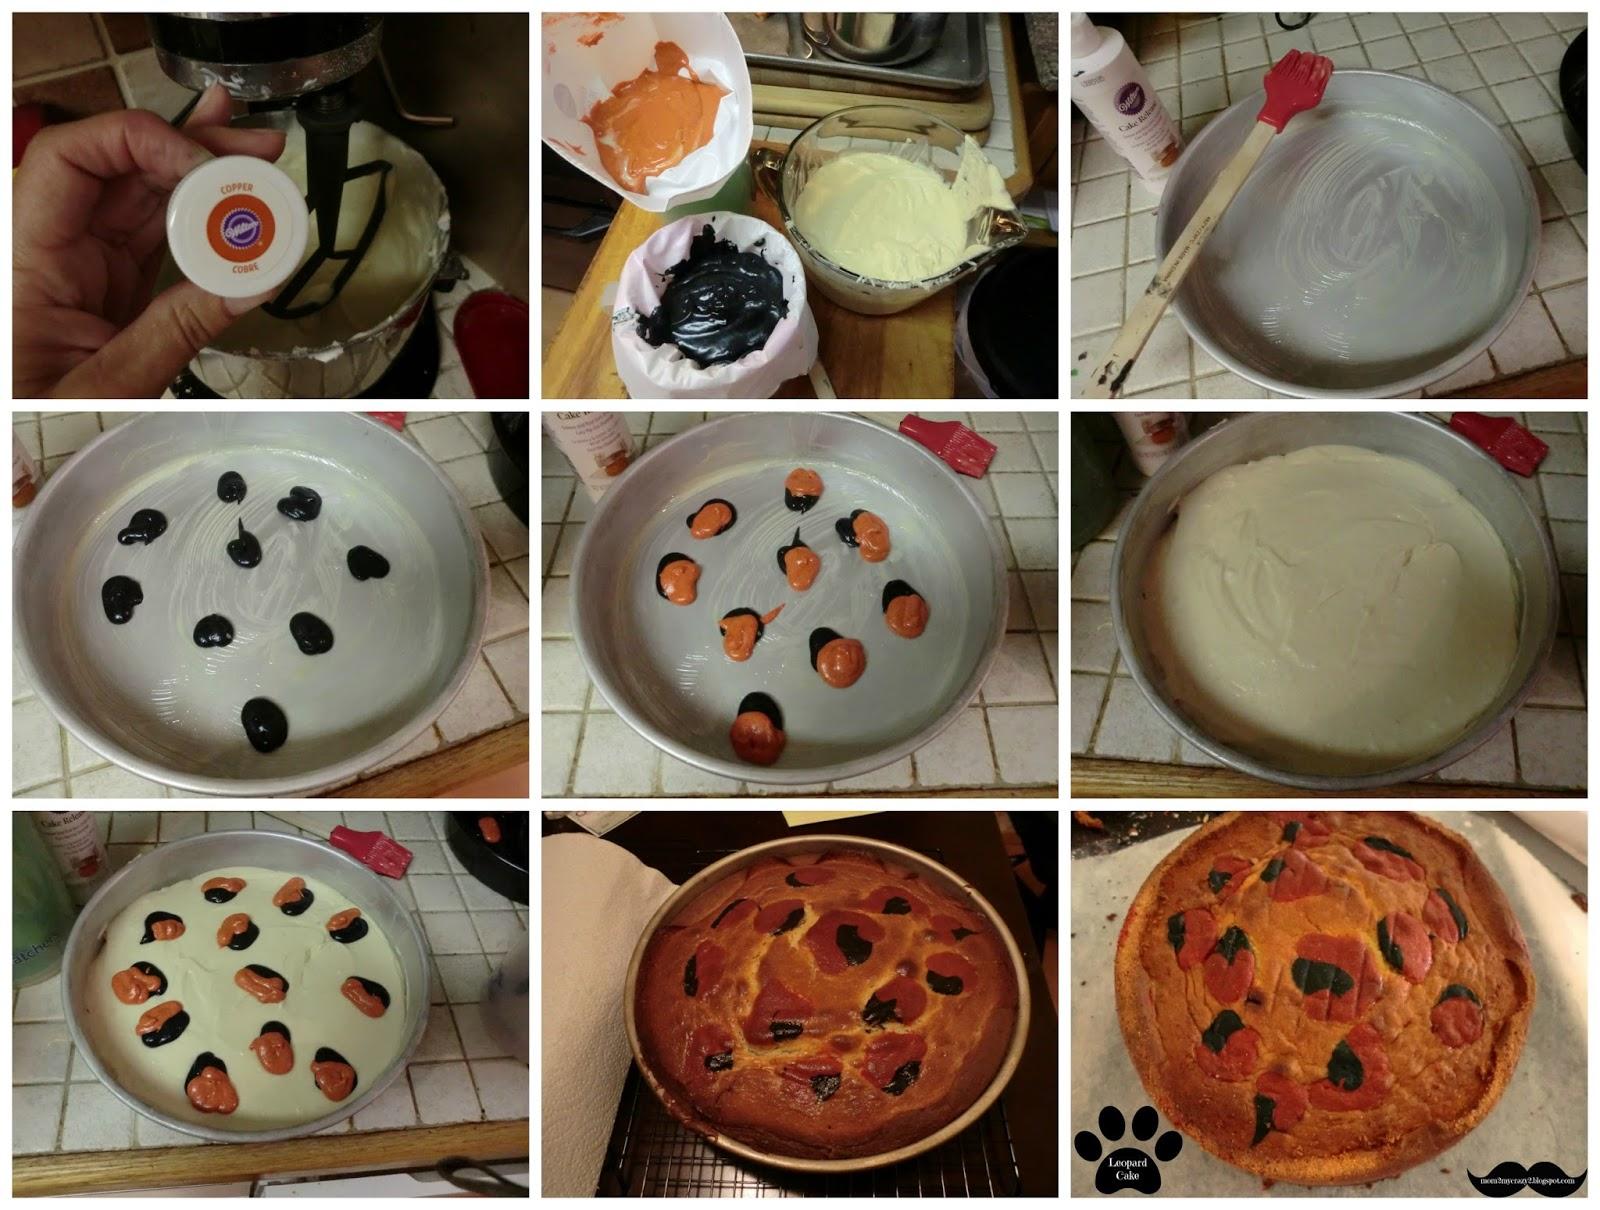 How Do You Bake A Cake With Spots Inside